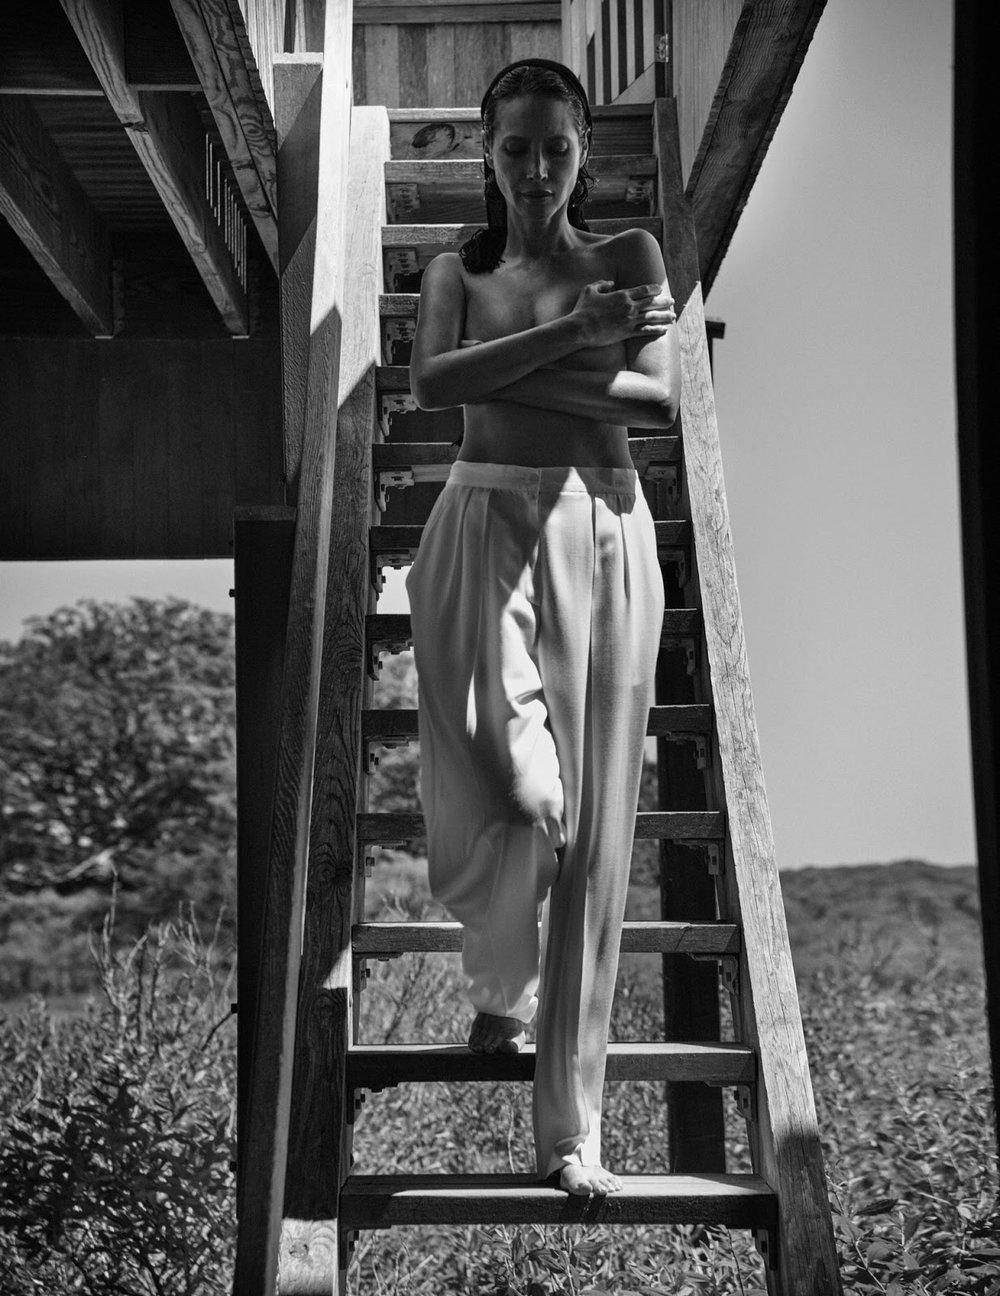 Christy Turlington by Chris Colls for Vogue Poland September 2018 (9).jpg